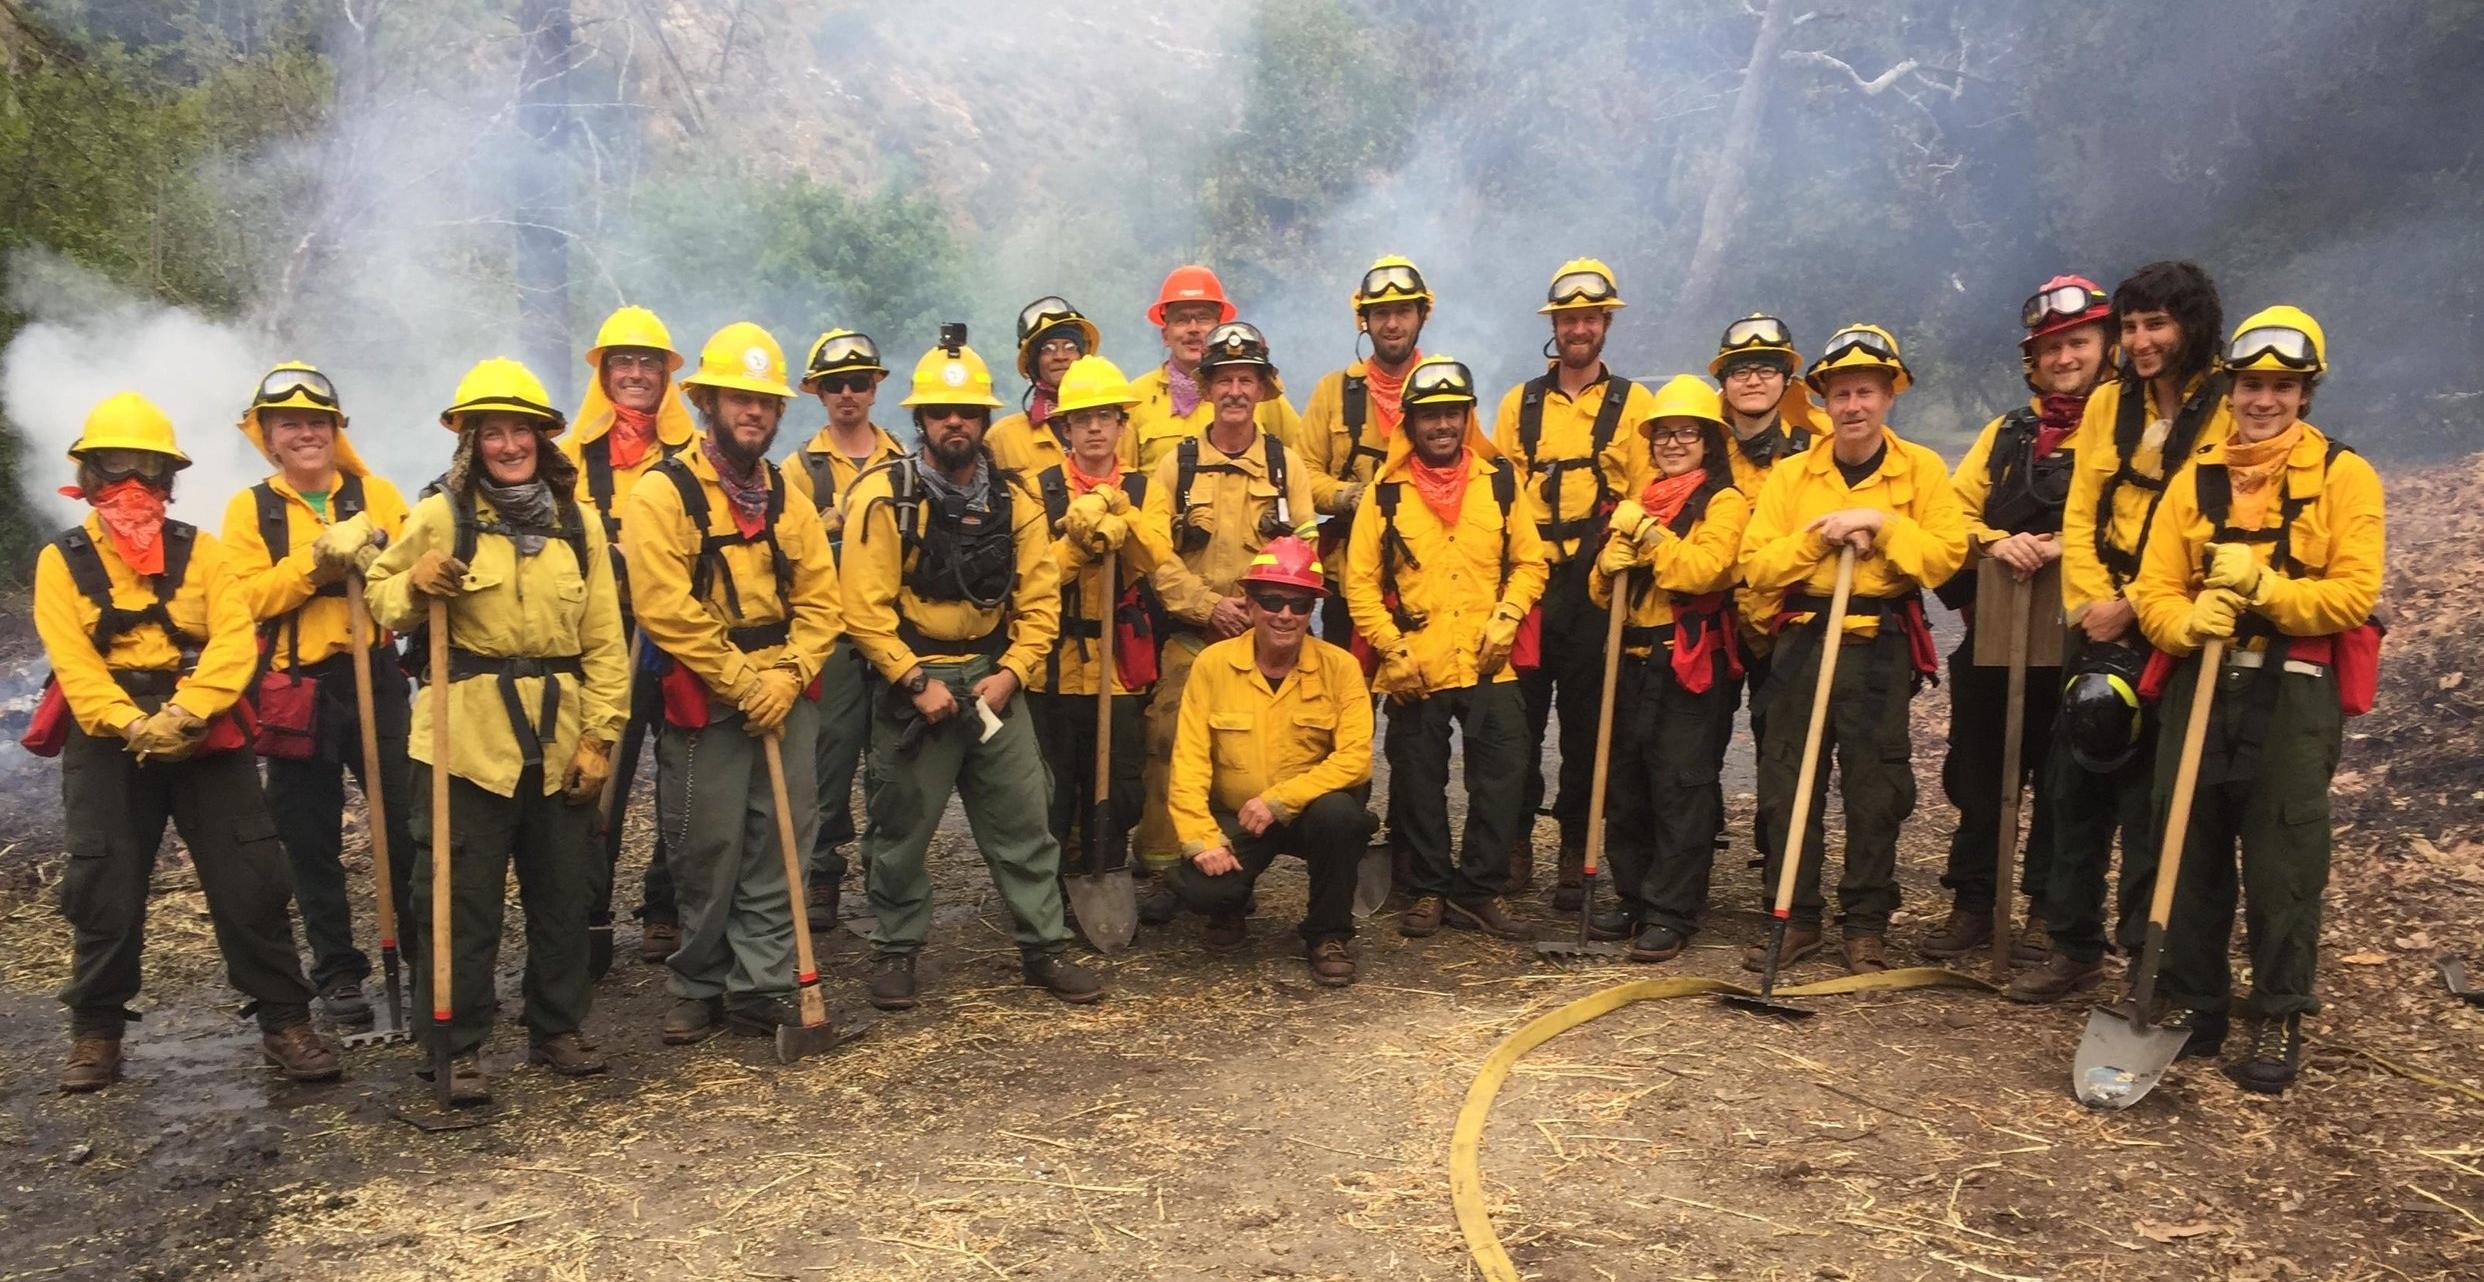 The Class of 2018 Tassajara Fire Academy. Photo courtesy Eric Moore, Central Coast Prescribed Fire Council.